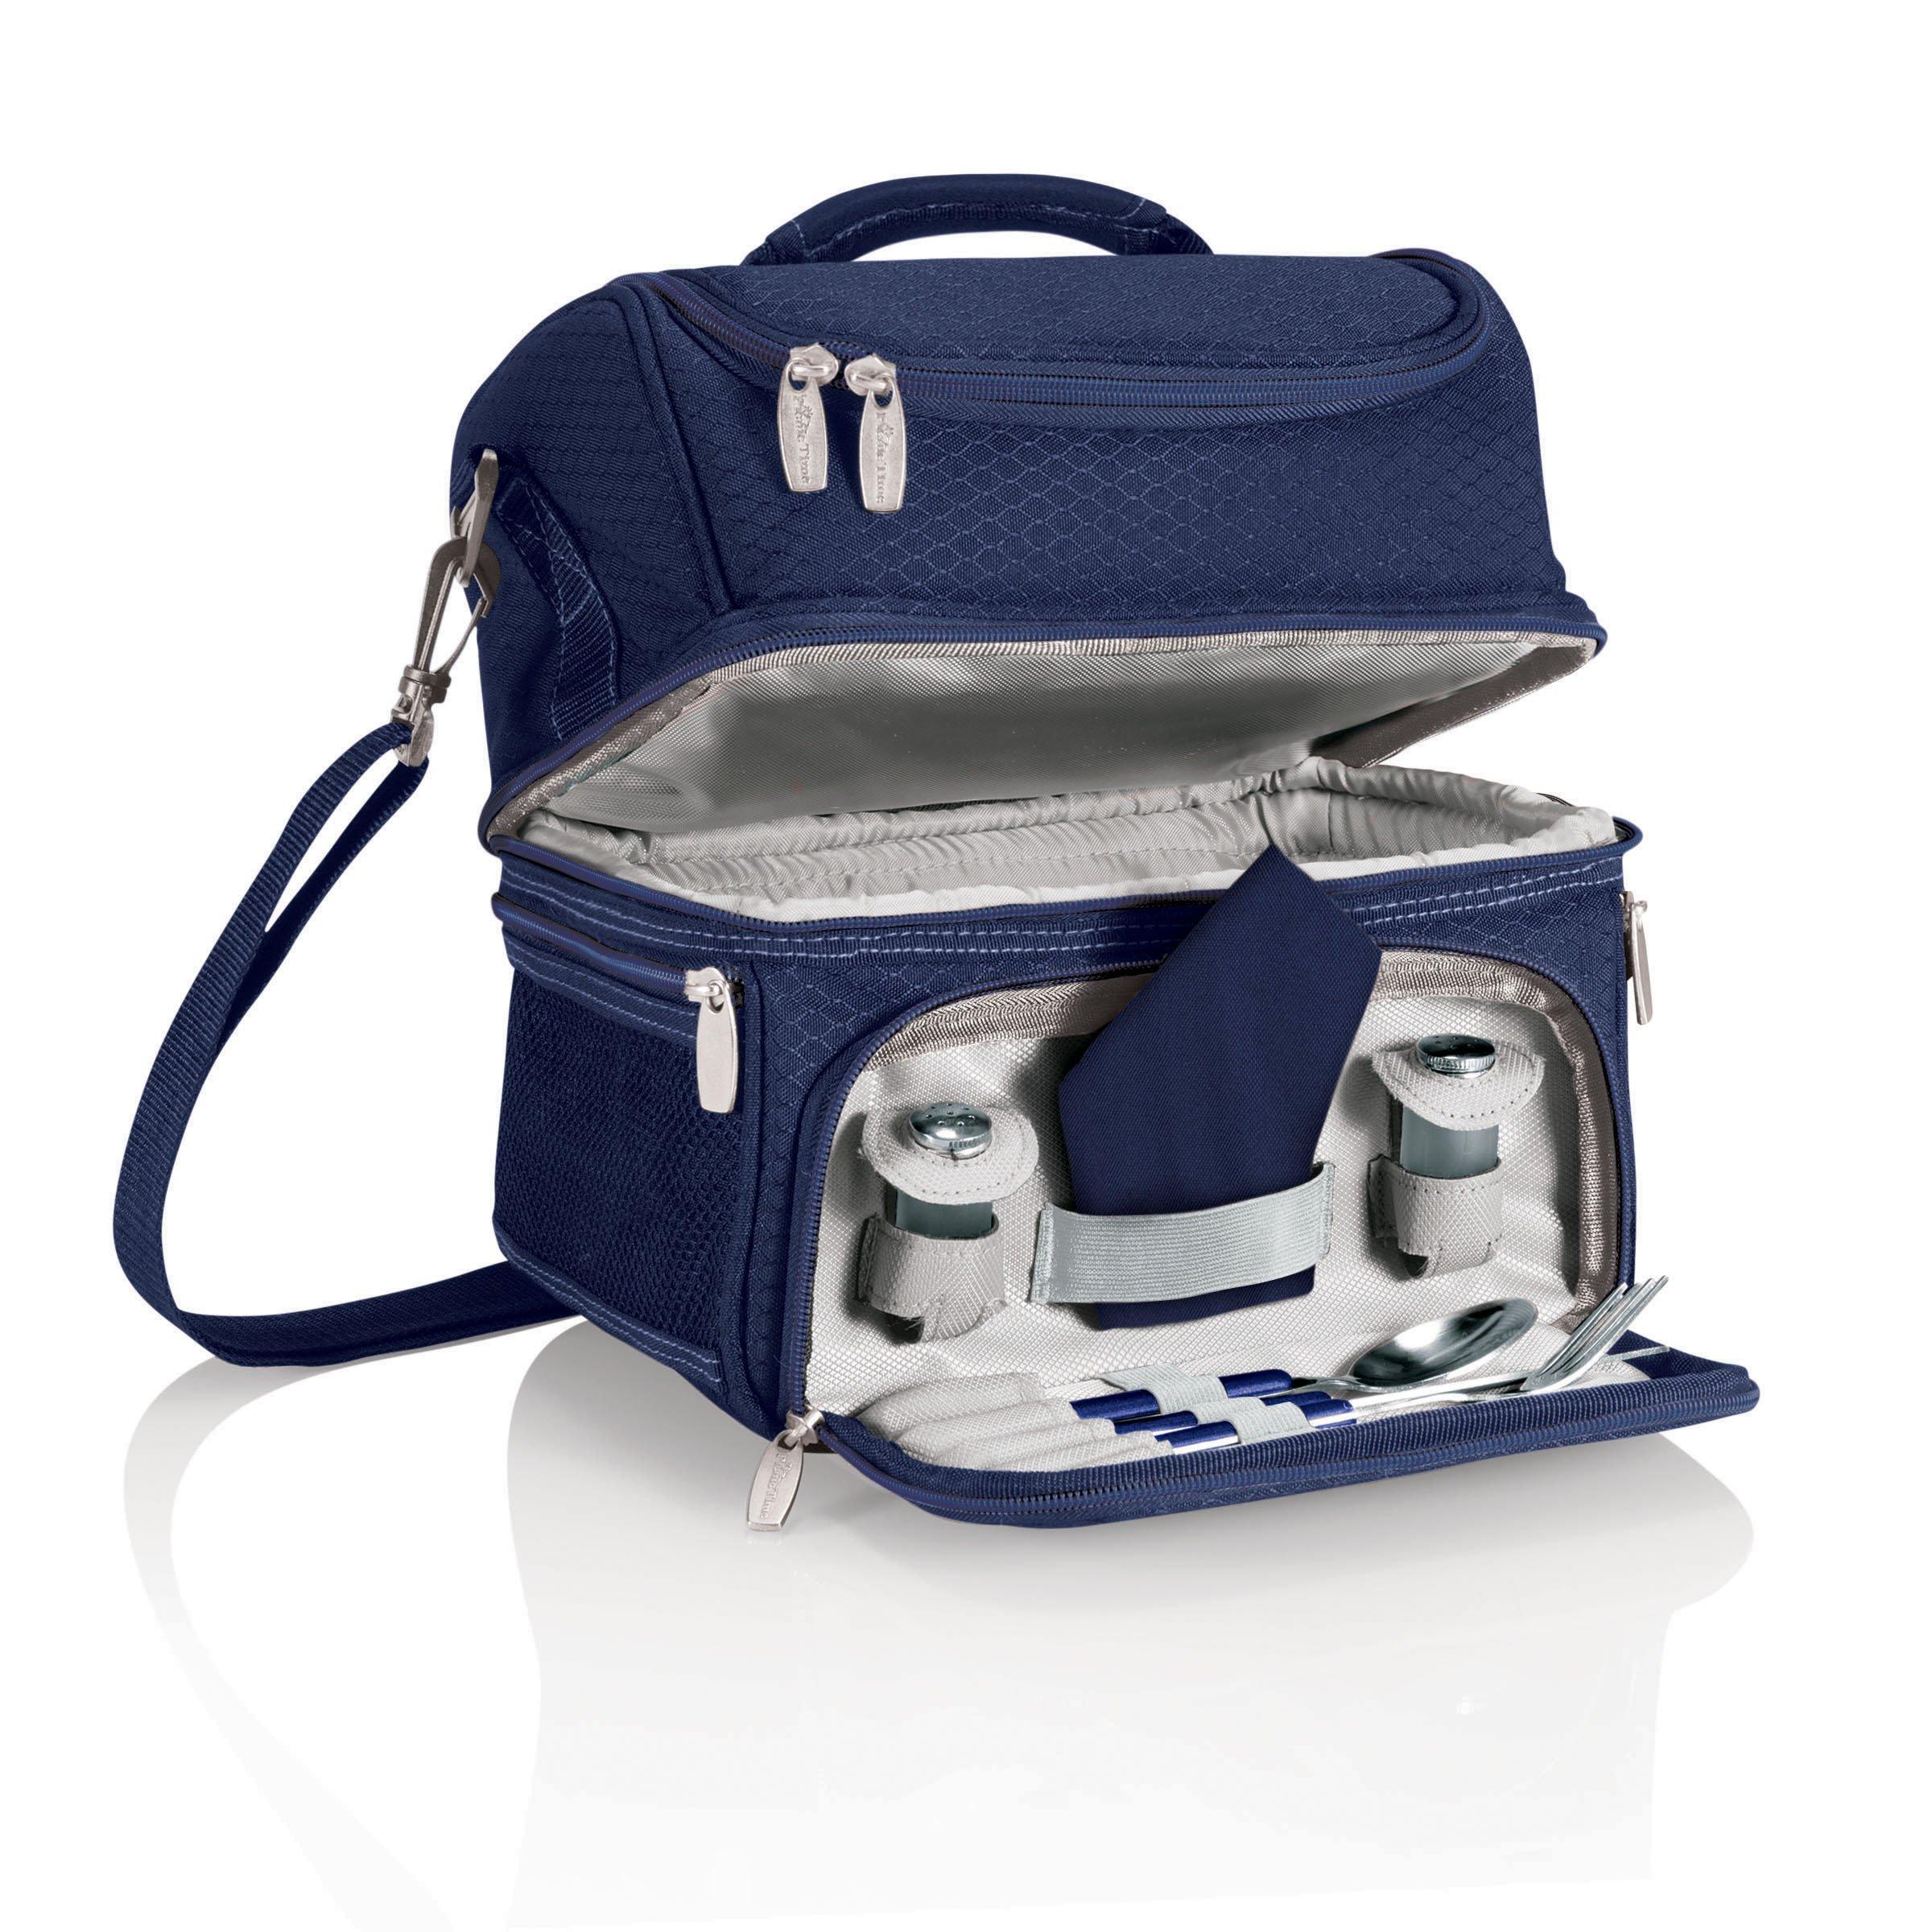 ONIVA - a Picnic Time Brand Pranzo Insulated Lunch Tote, Navy by ONIVA - a Picnic Time brand